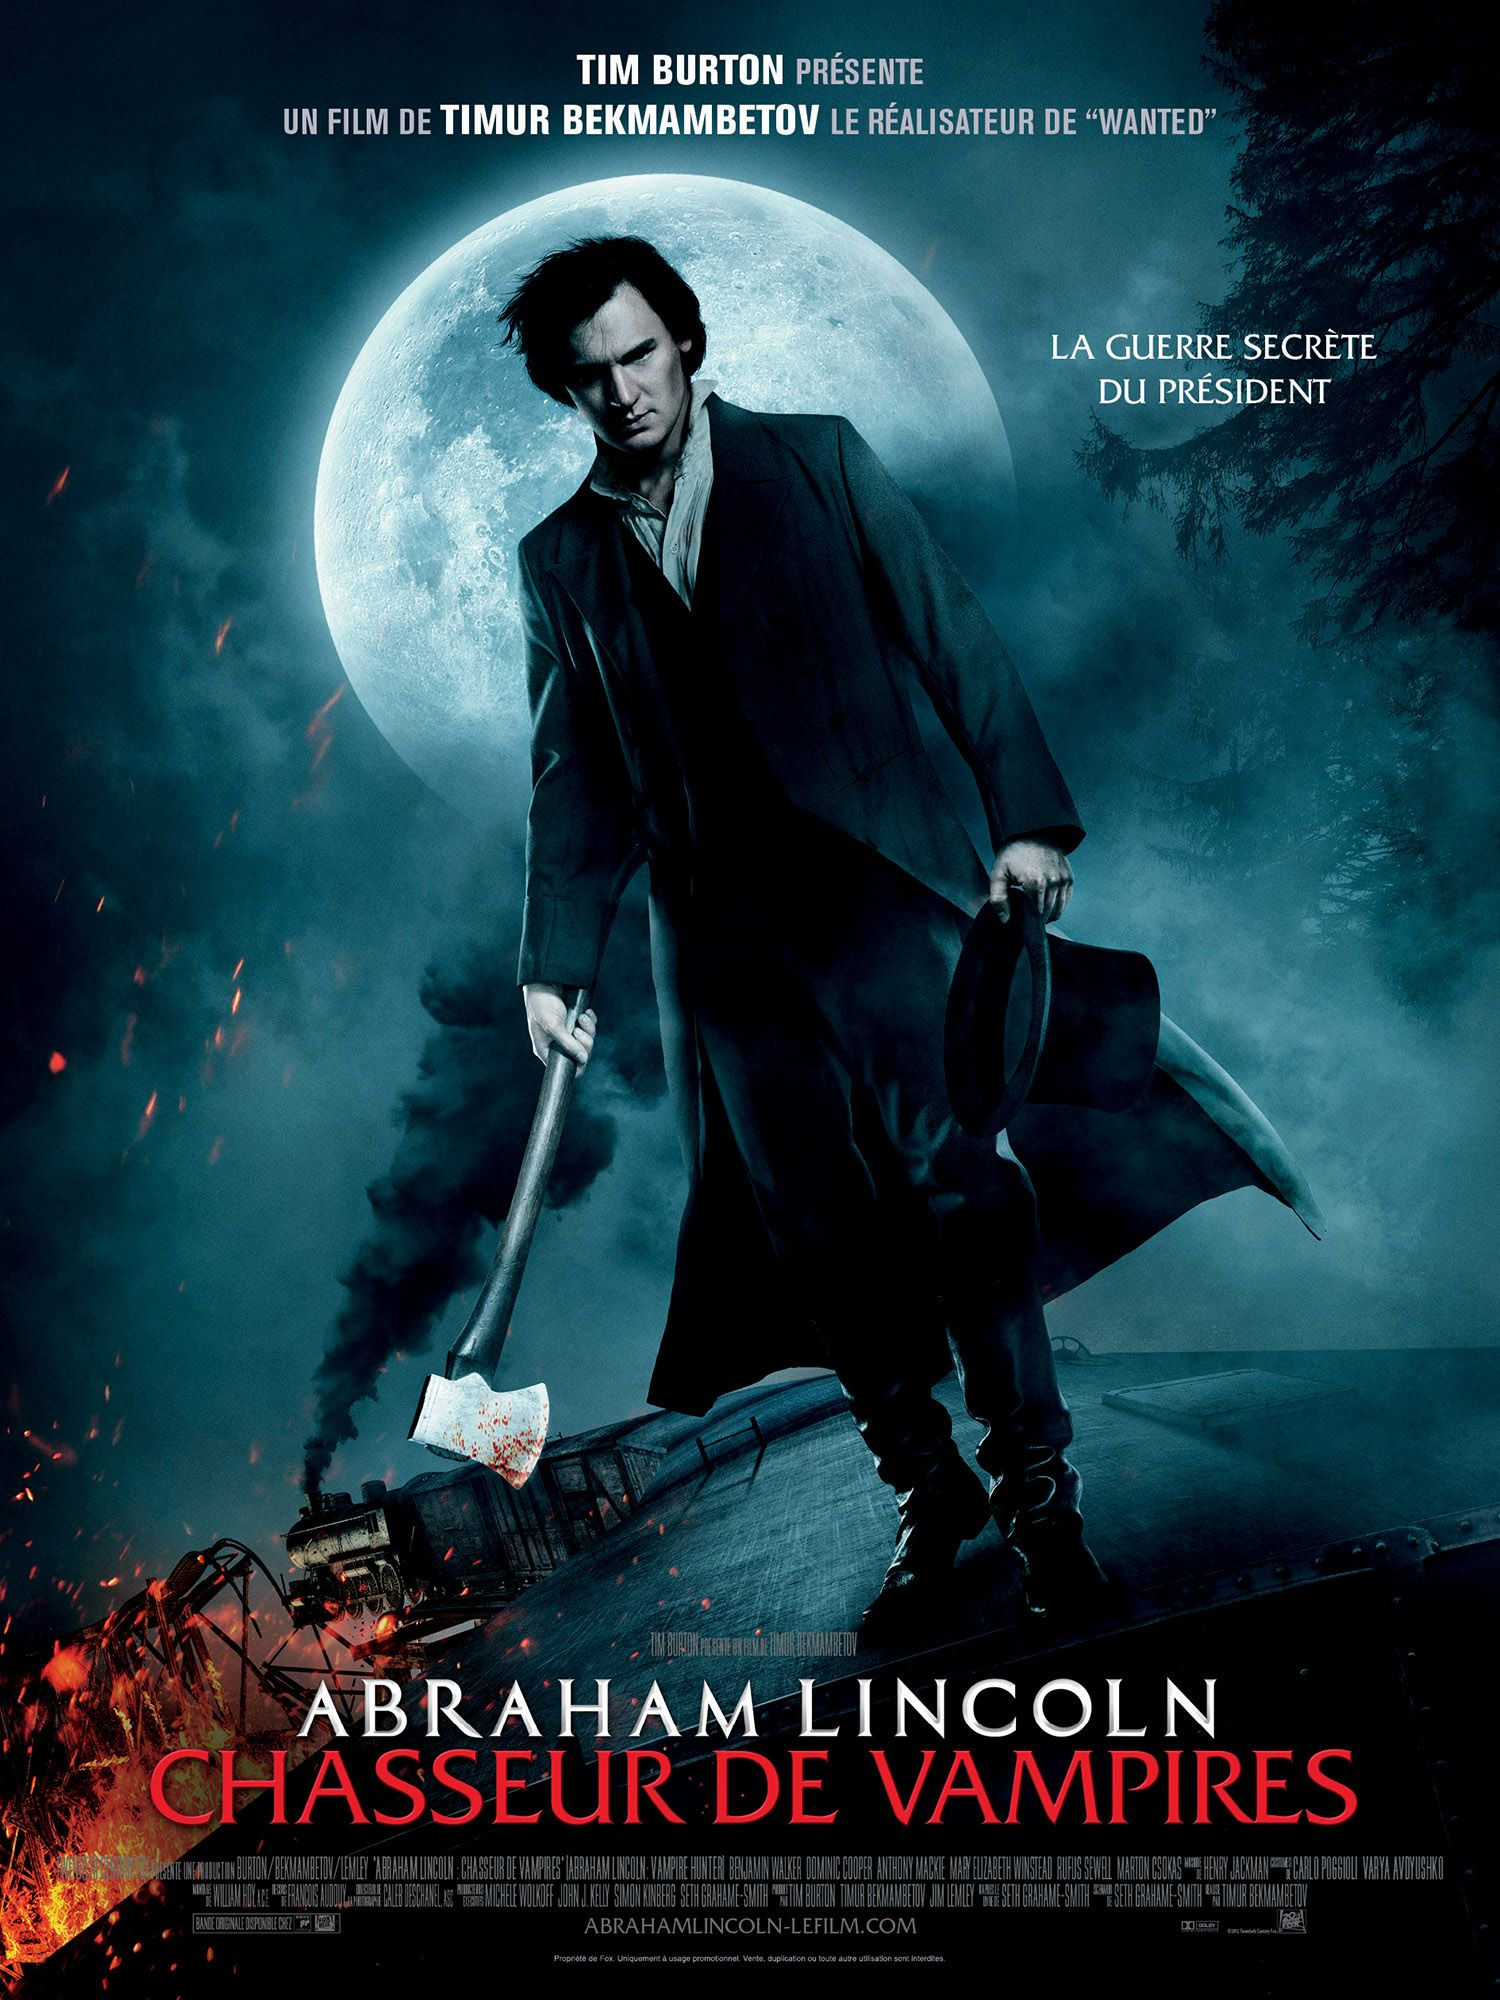 Regarder Animaux Fantastiques 2 Les Crimes De Grindelwald En Streaming Abraham Lincoln Chasseur De Vampires 08 08 2012 Film De Vampire Film Fantastique Film